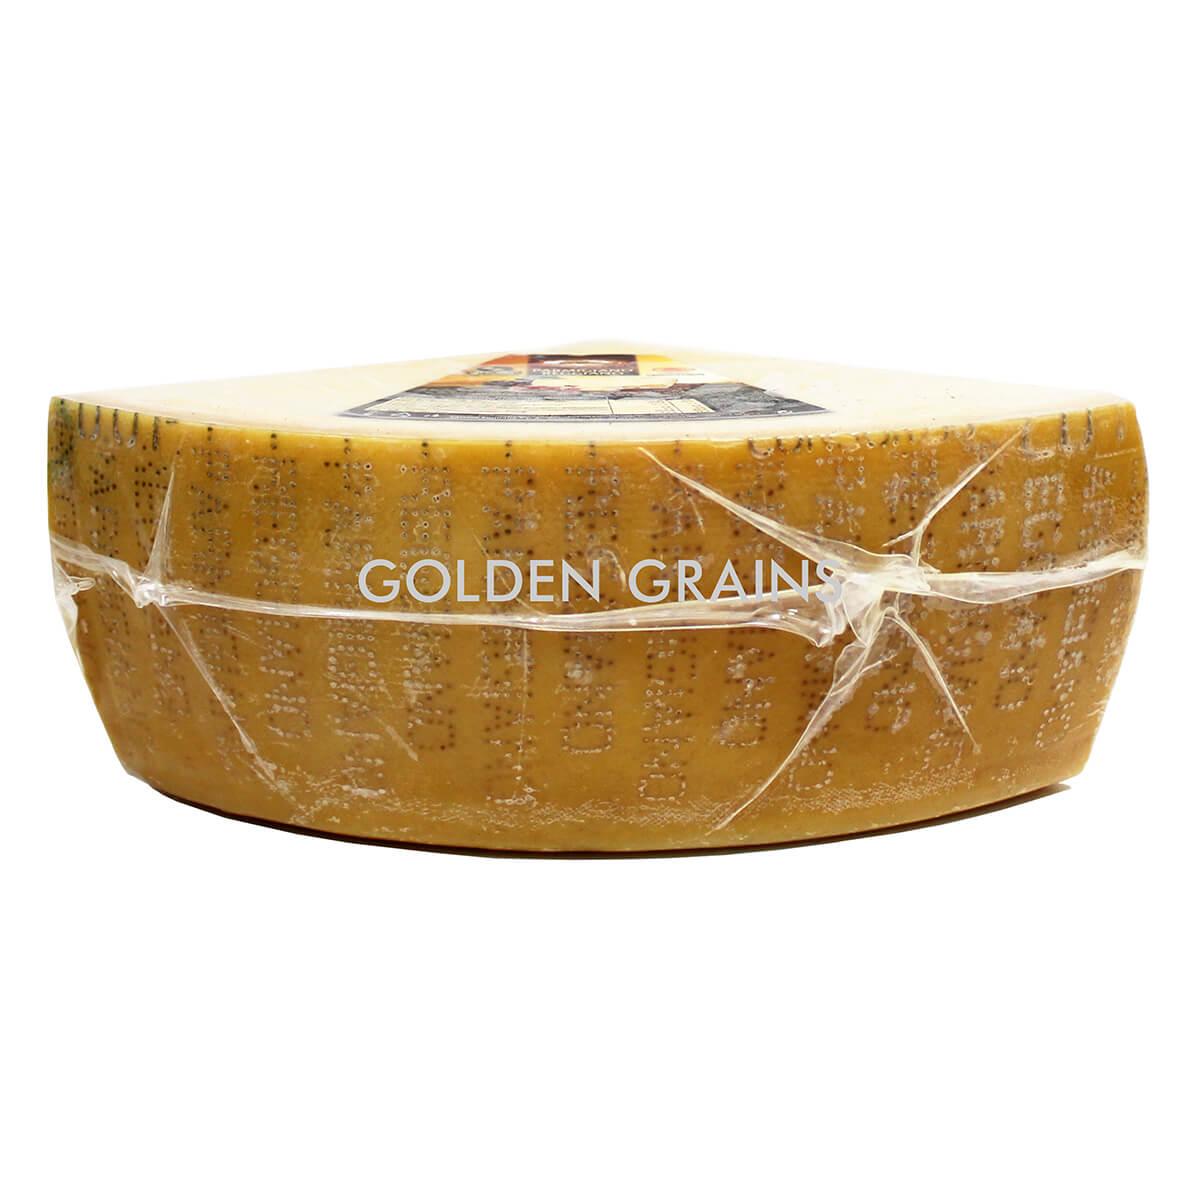 Golden Grains Dubai Export - Parmigiano Reggiano - Back.jpg